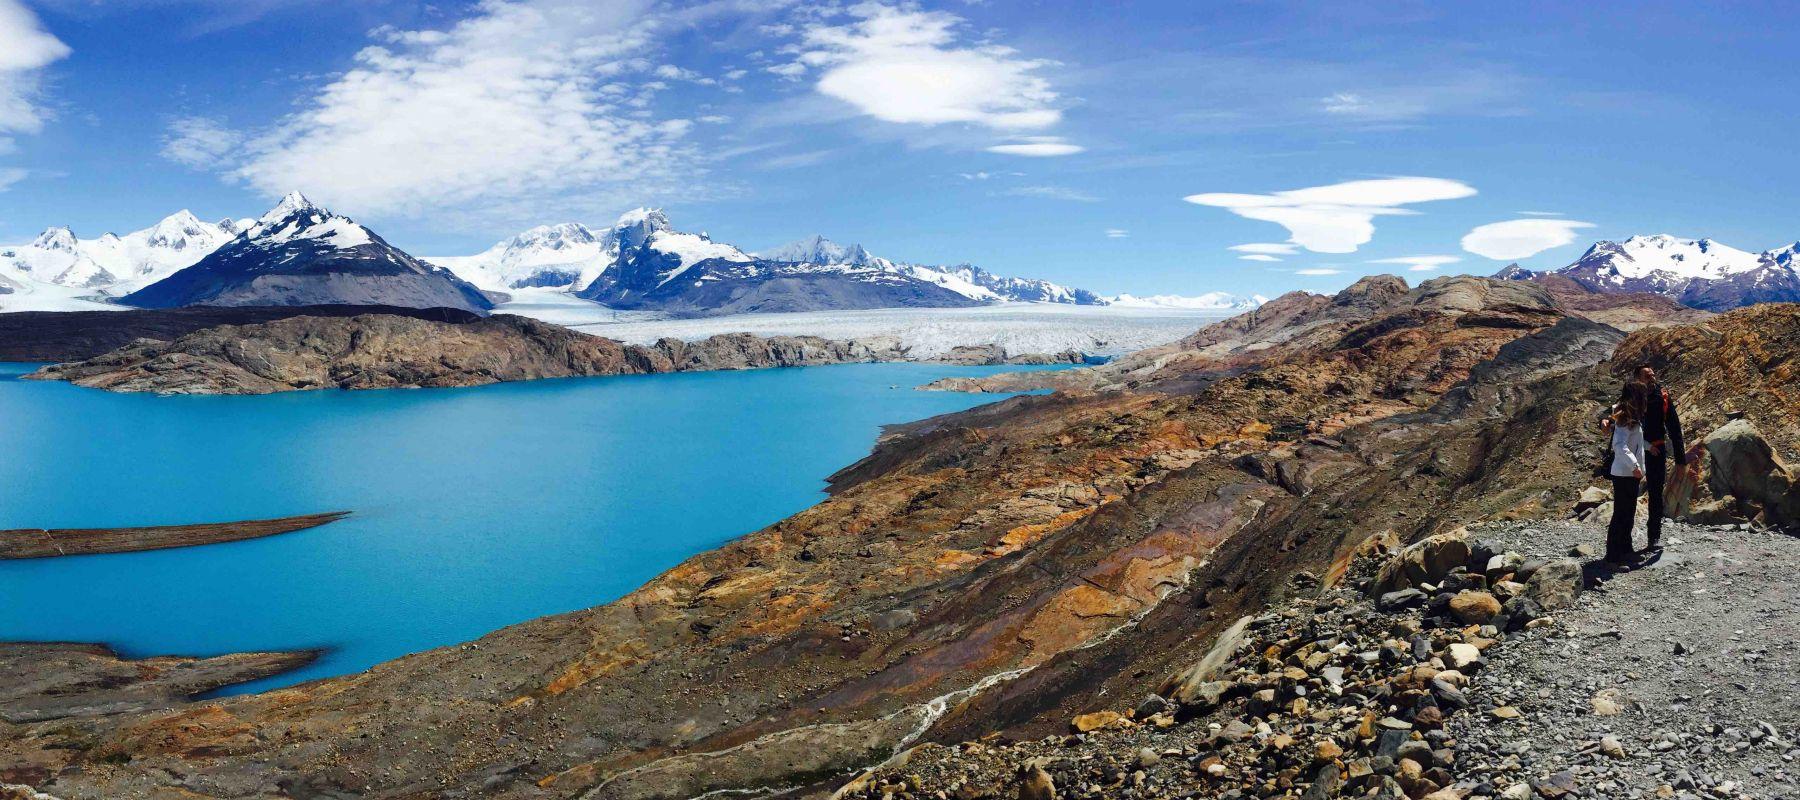 206289d54ad2 Argentina Patagonia Hiking Tour BikeHike Lead image 1